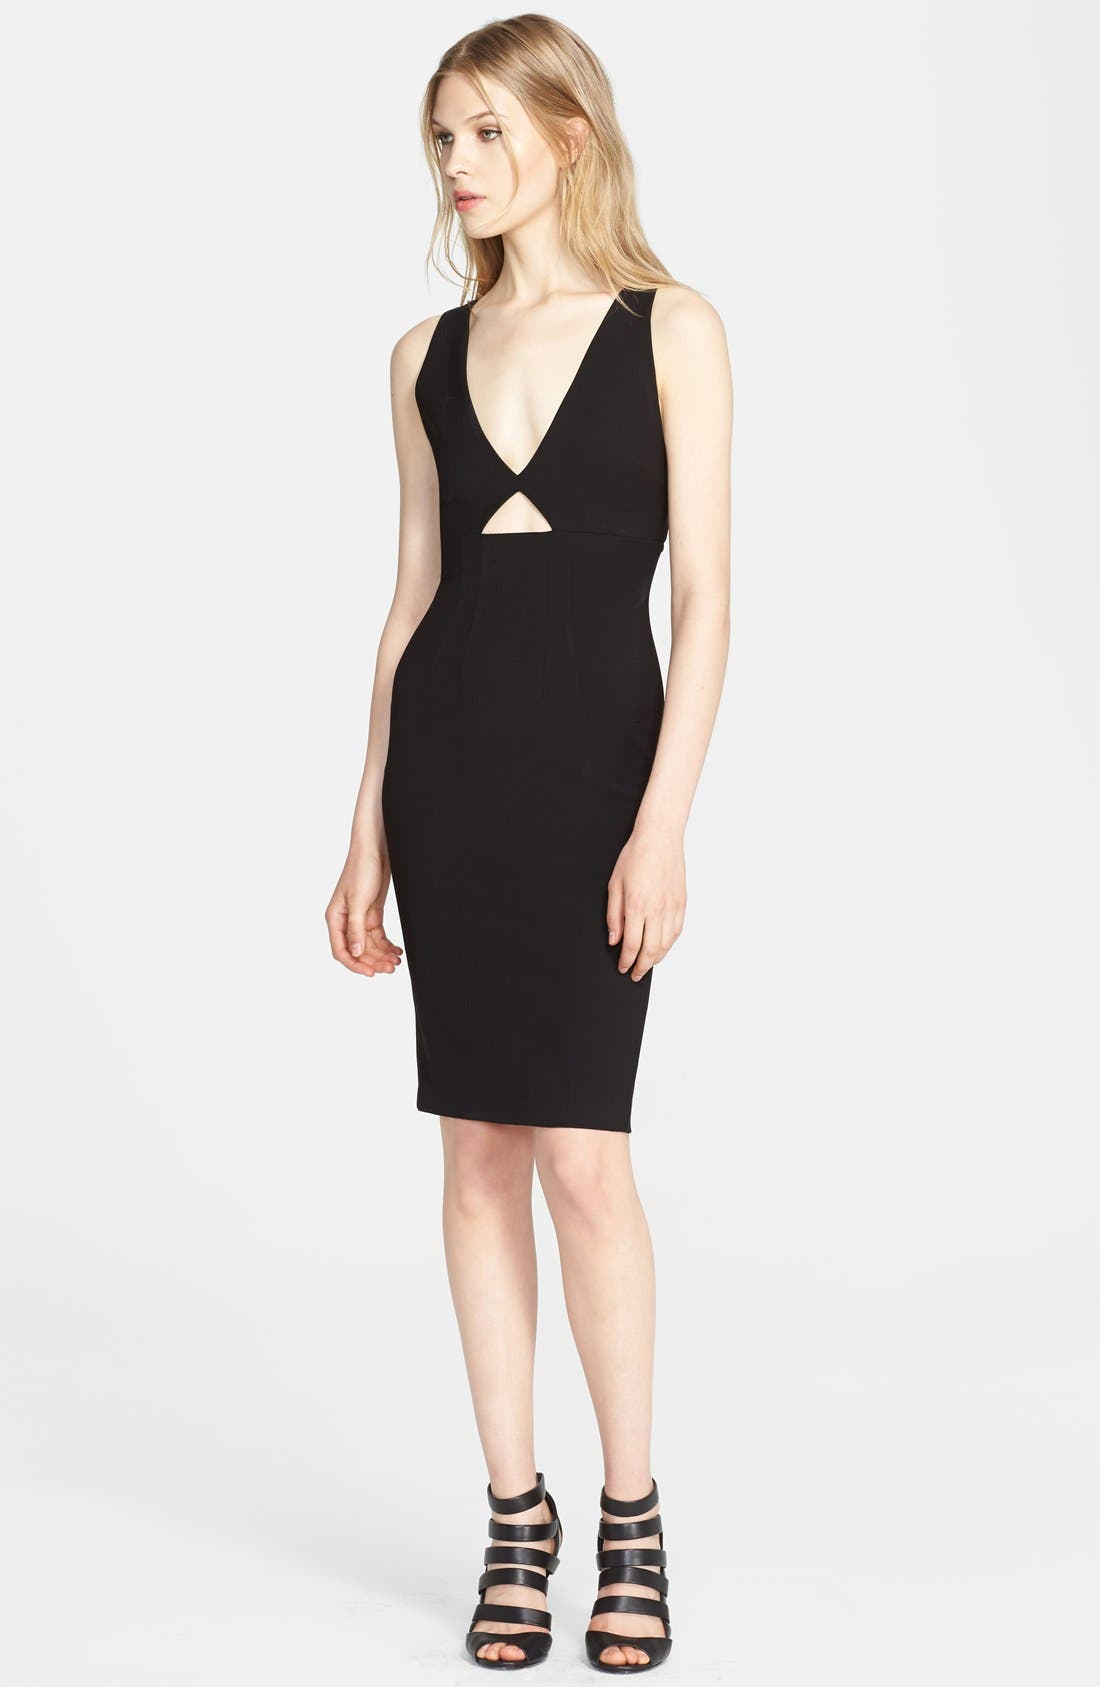 Alternate Image 1 Selected - Alice + Olivia 'Yve' Cutout Sheath Dress